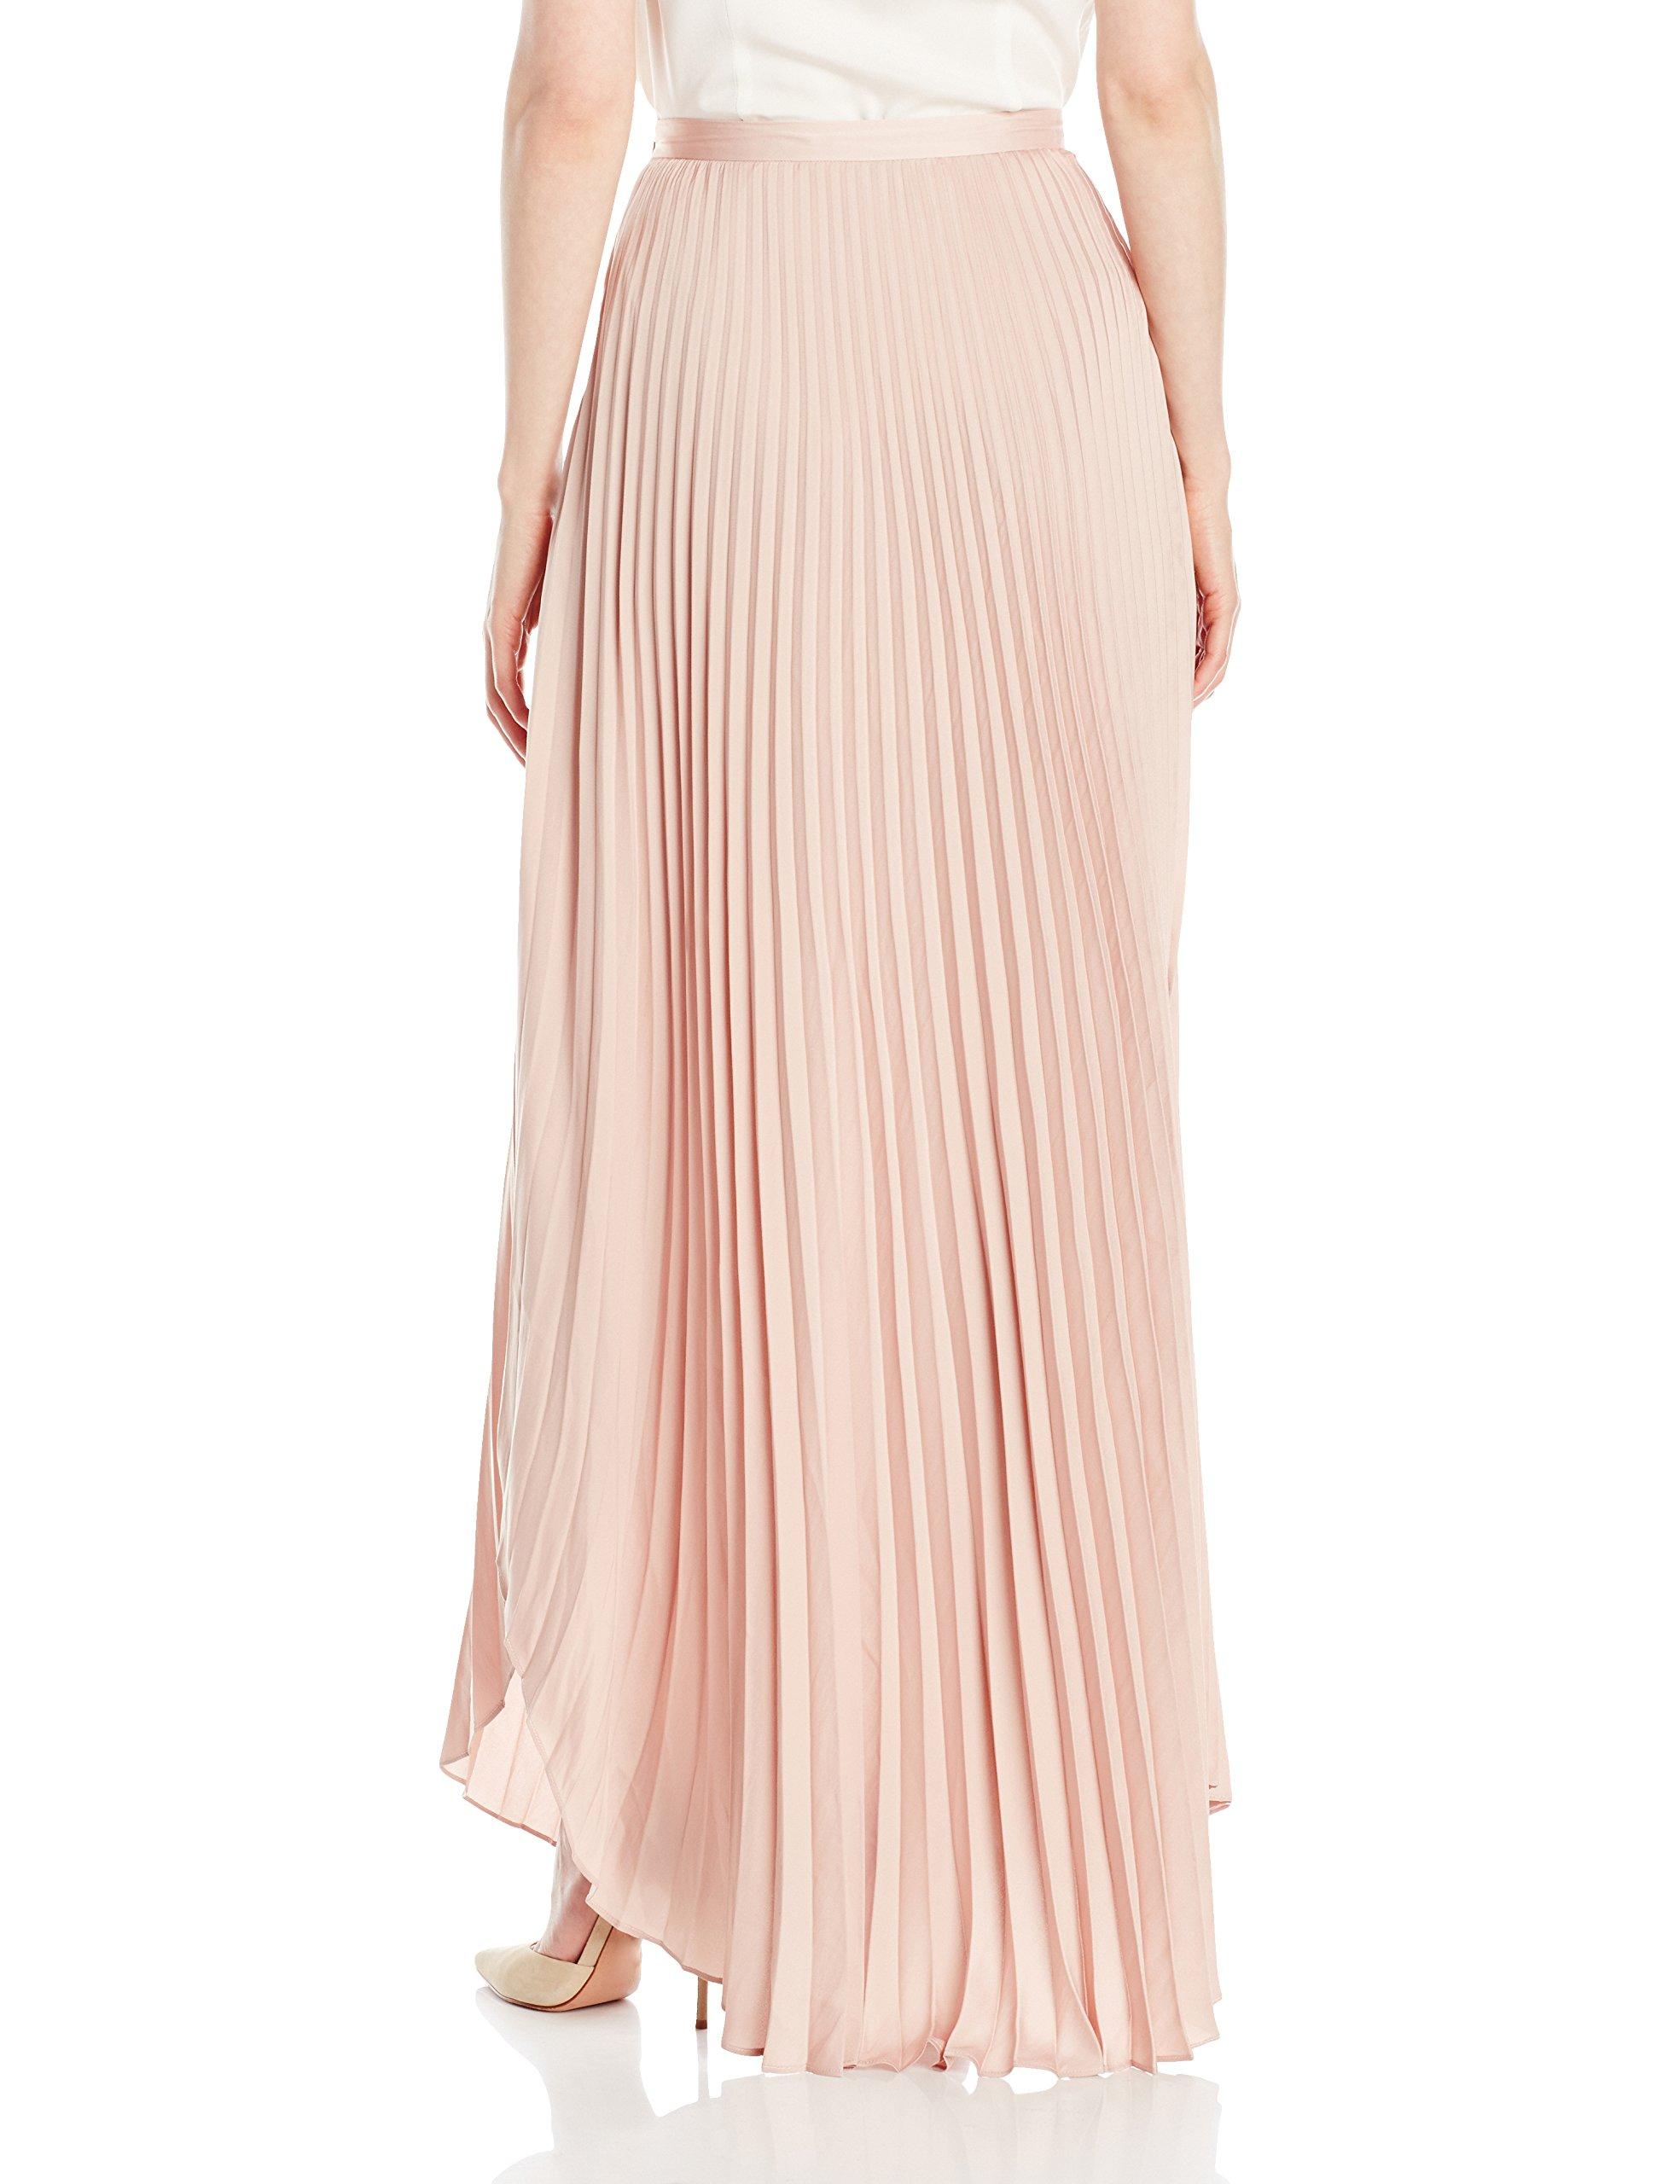 Dolce Vita Women's Camryn Maxi Skirt, Dusty Rose, S